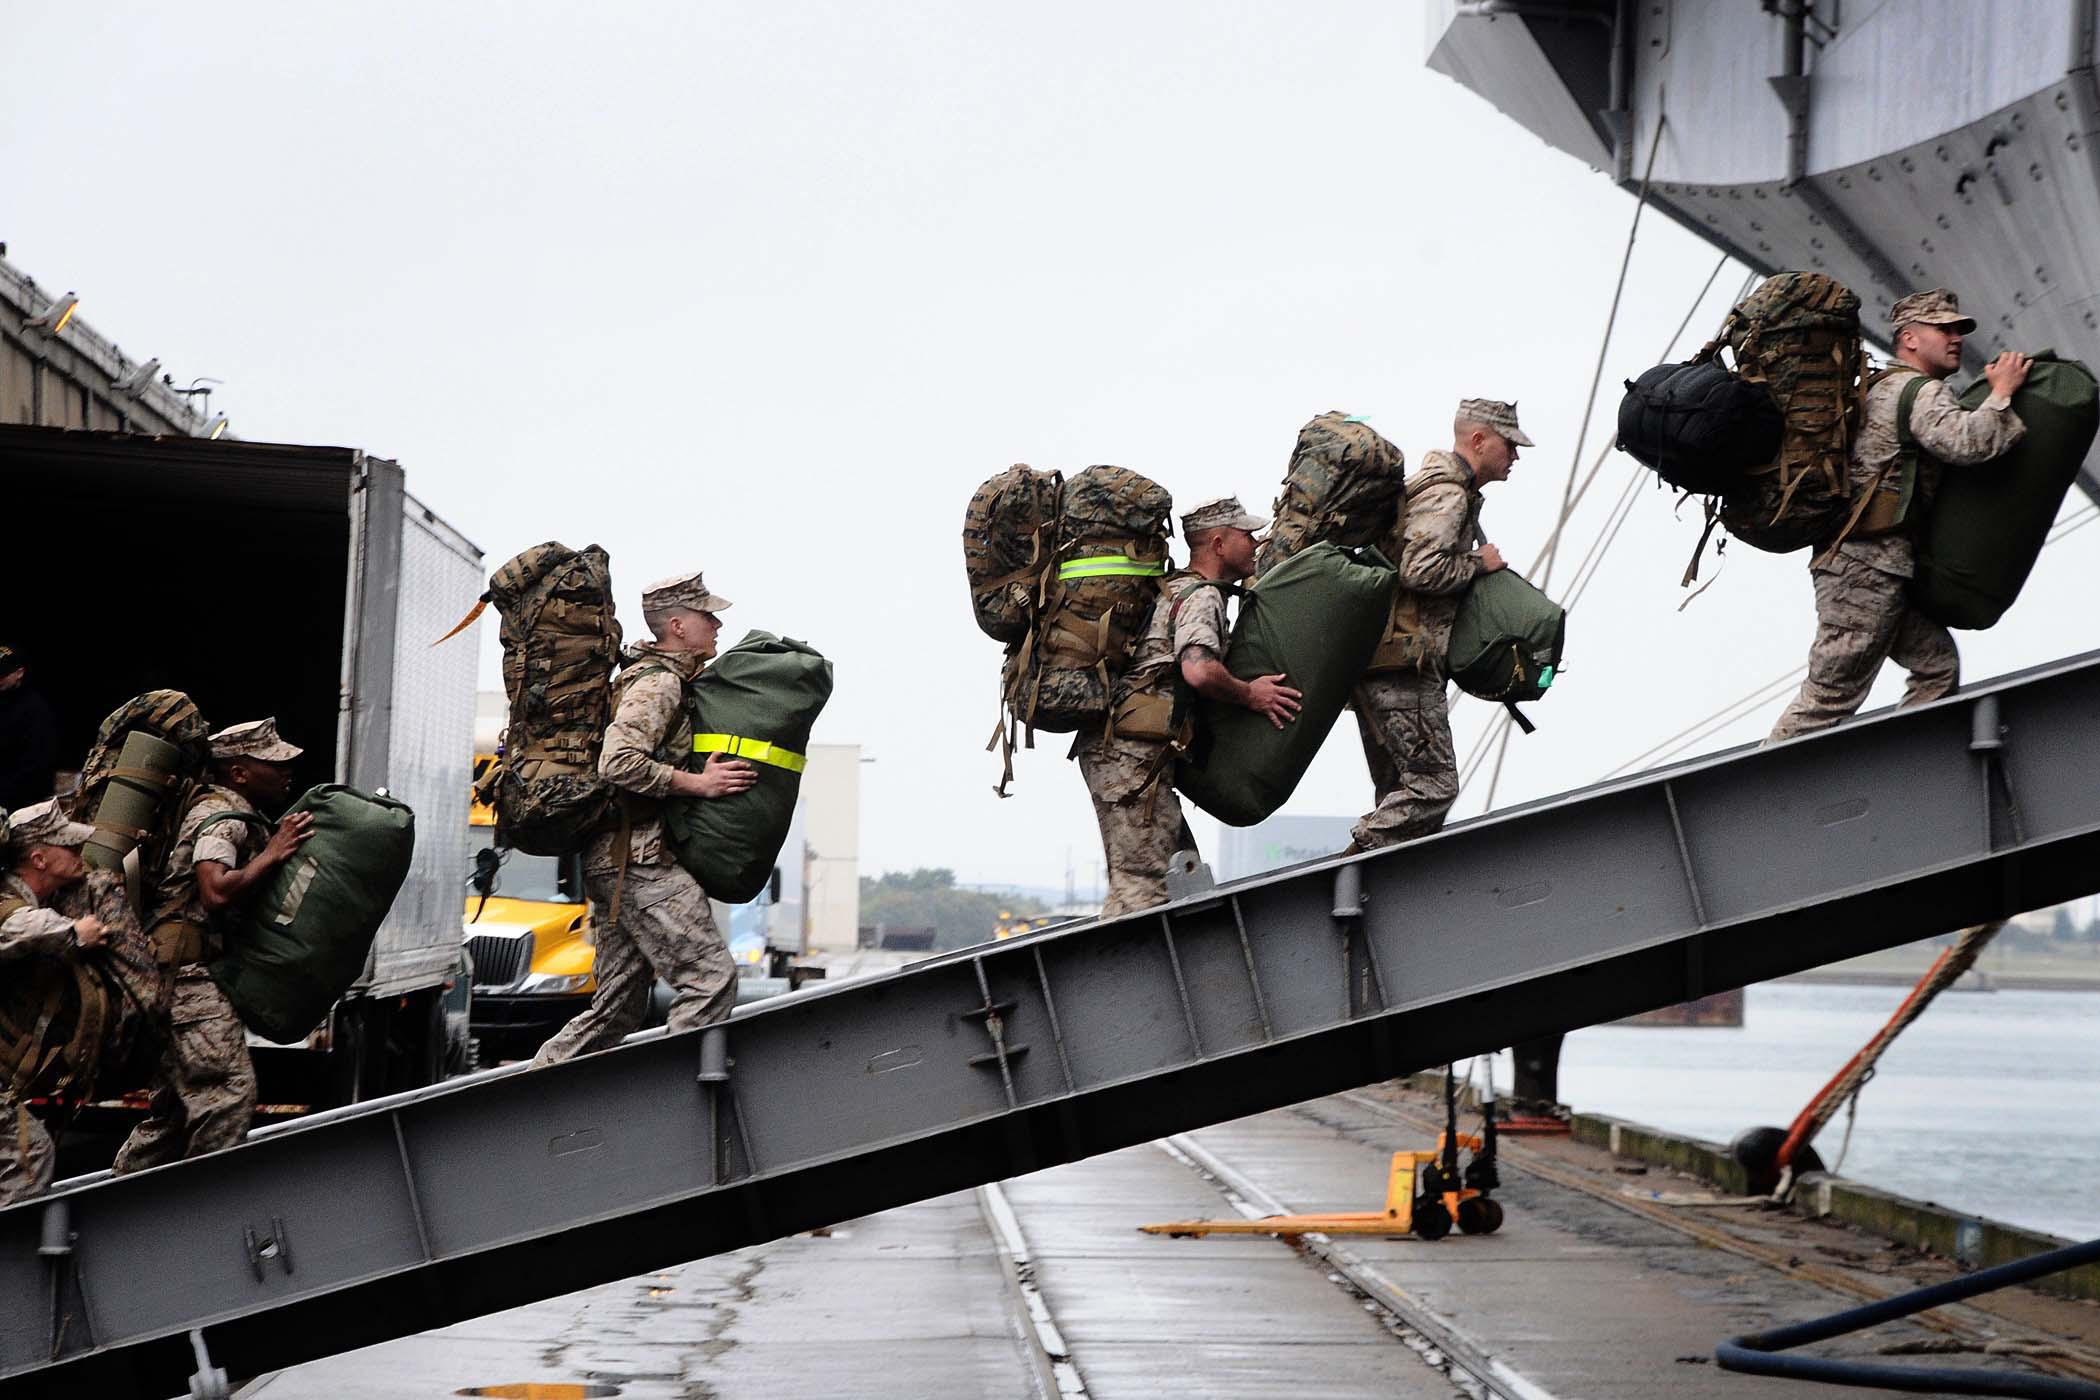 Superior File:Defense.gov News Photo 110328 N 7508R 142   U.S.